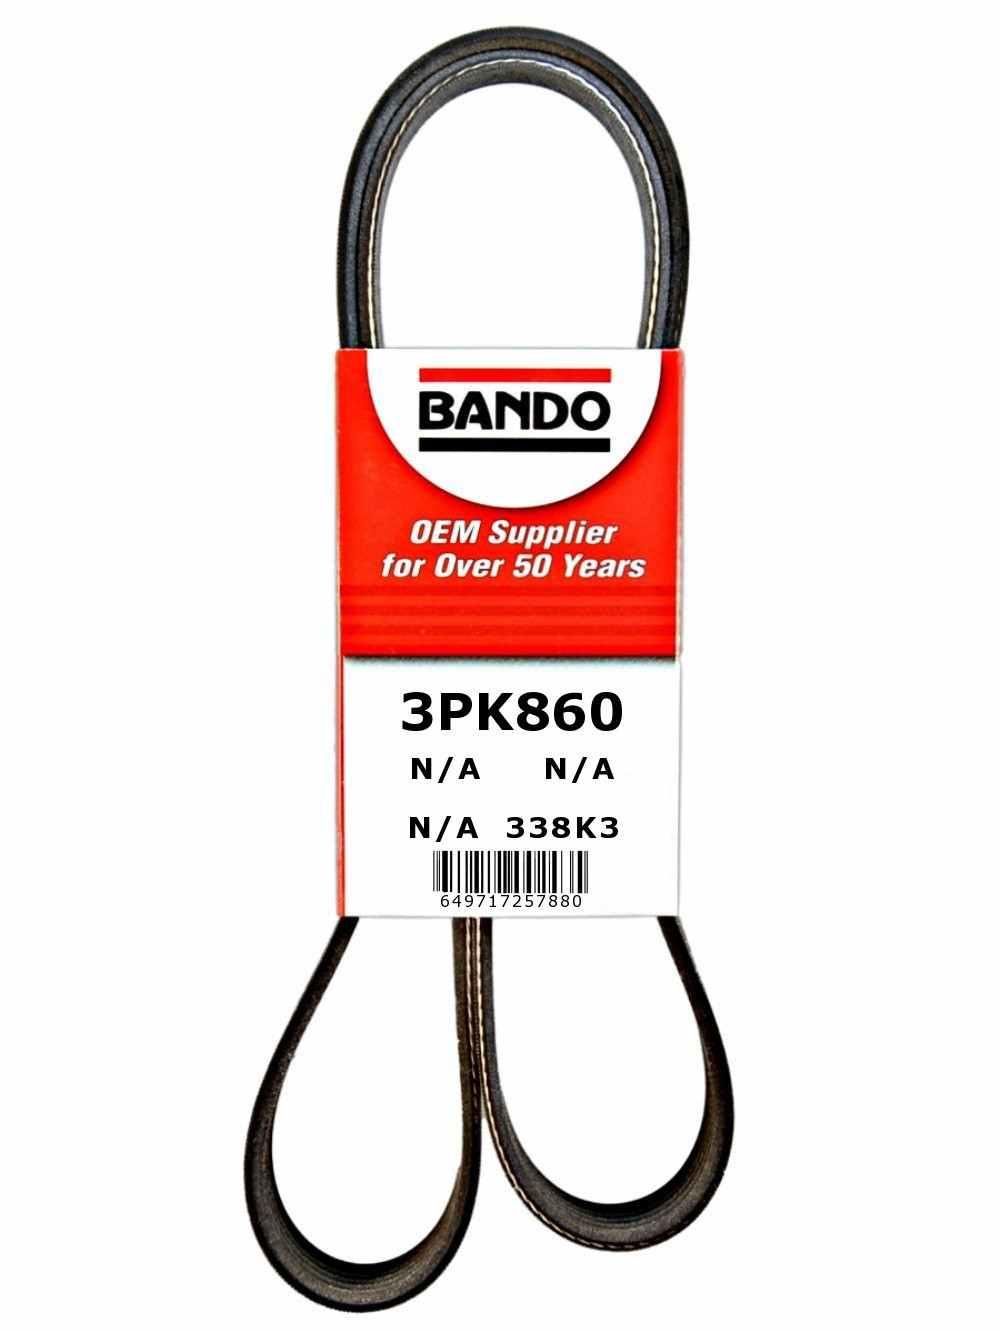 BANDO - Rib Ace Precision Engineered V-Ribbed Belt - BWO 3PK860